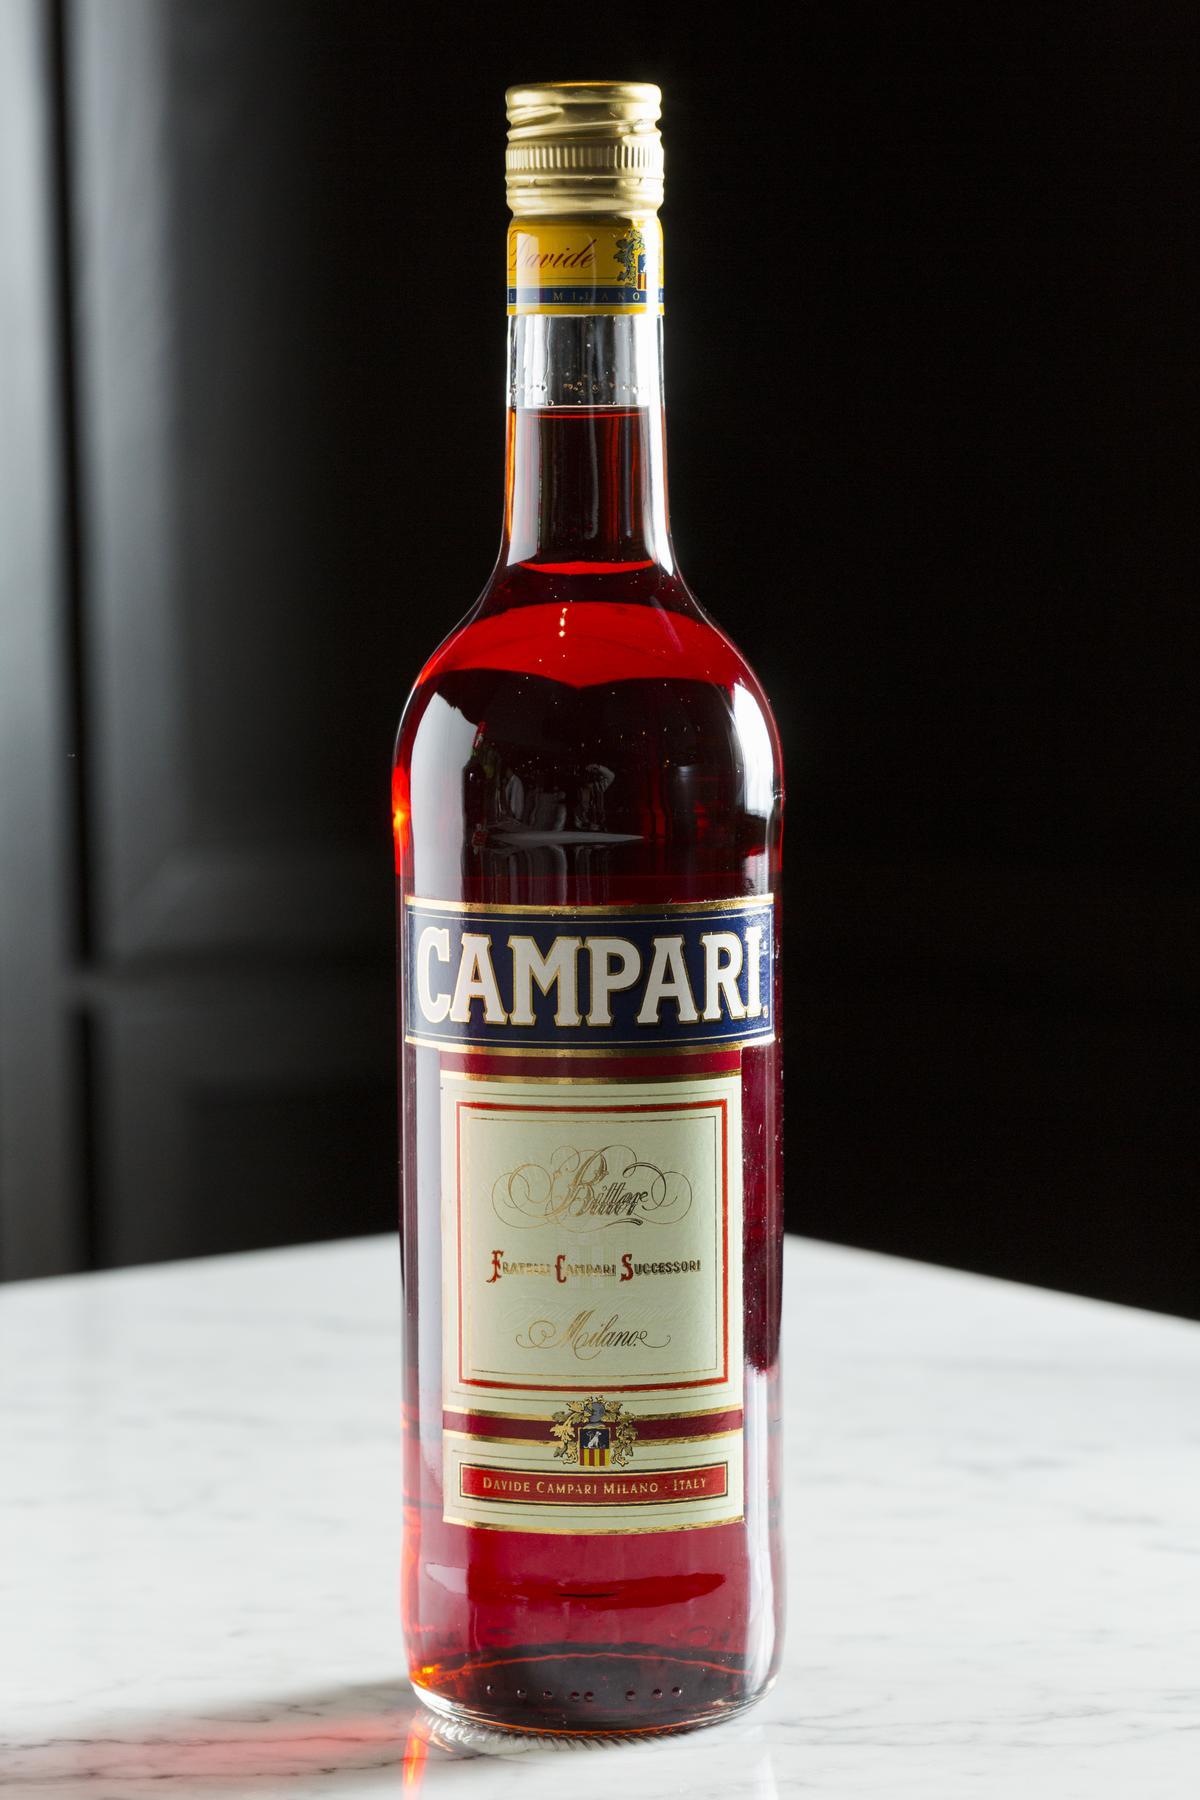 「CAMPARI」是義大利最有名的香料苦甜酒,鮮紅色酒液識別度極高。